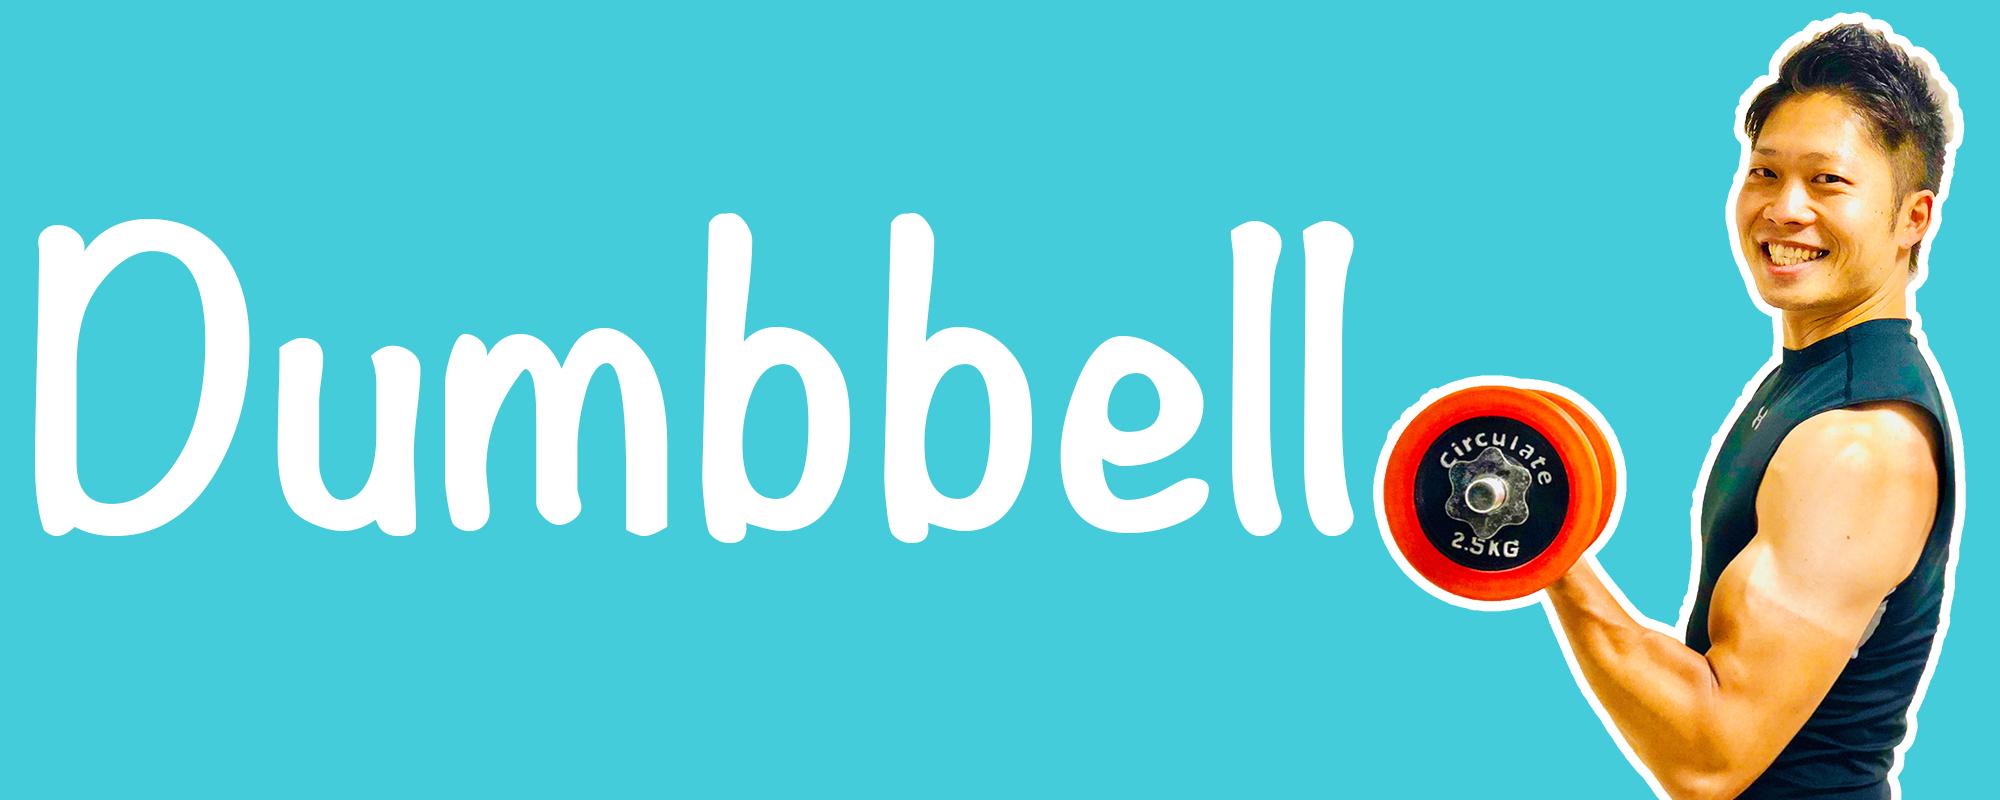 Dumbbell workout program